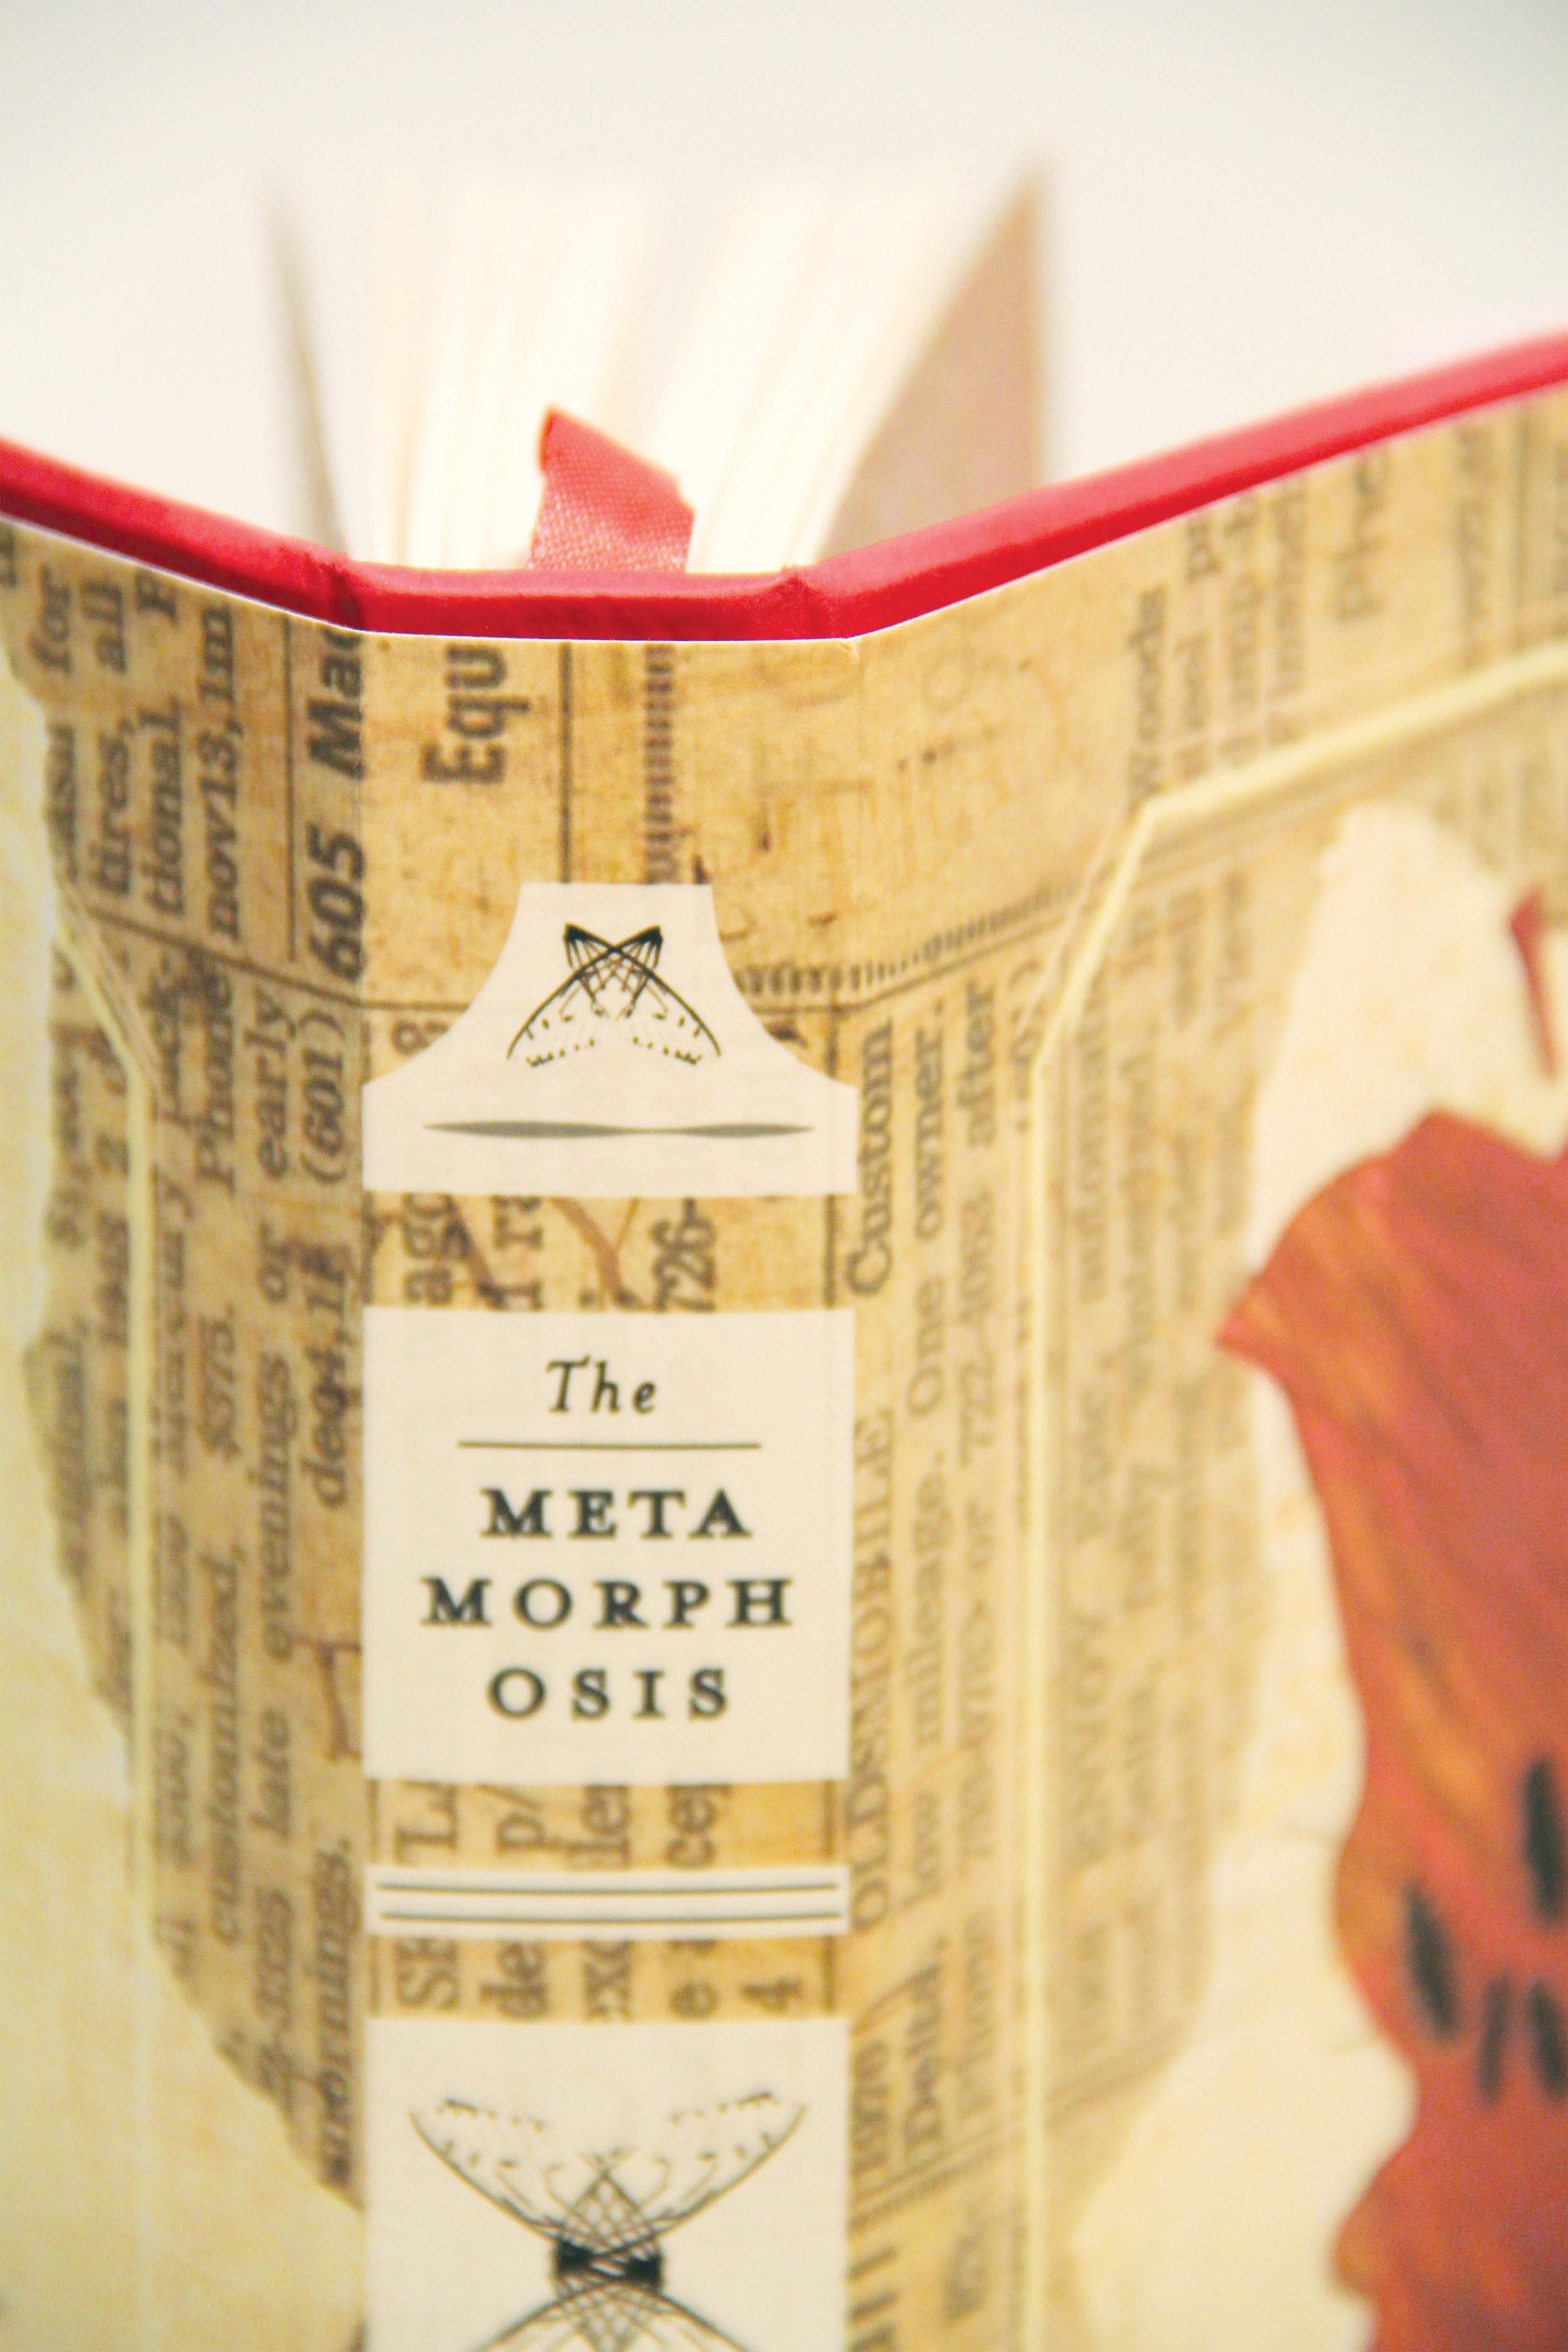 The Metamorphosis side of book cover